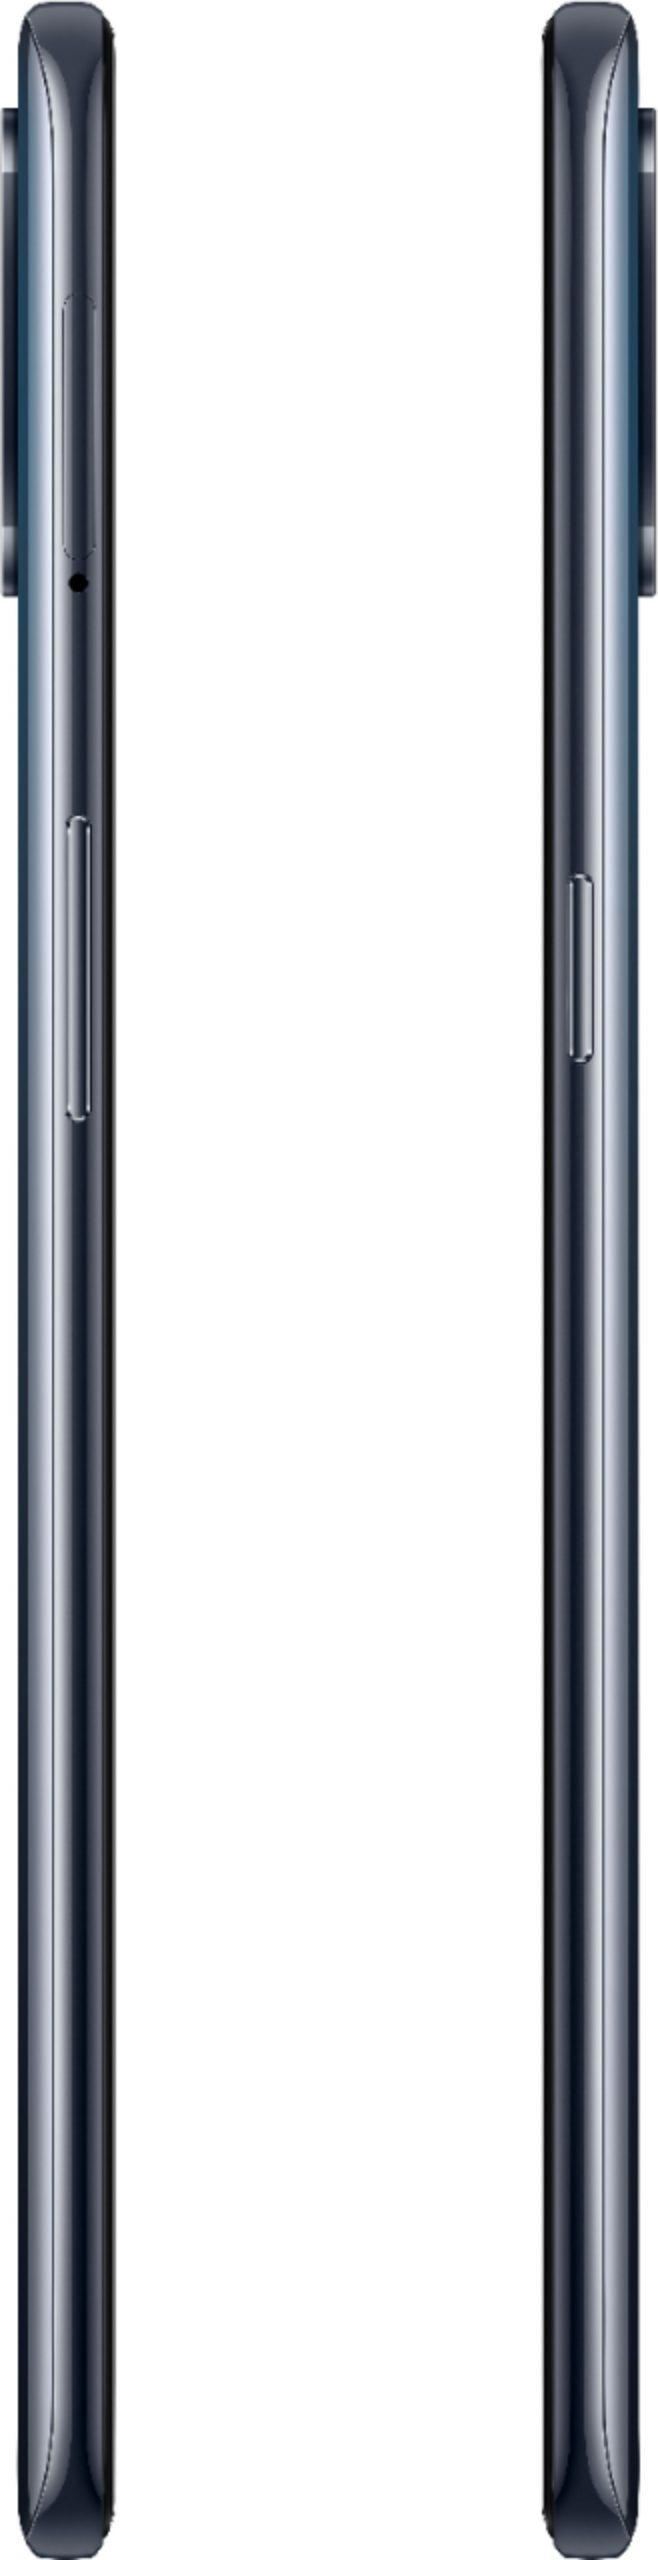 OnePlus Nord N10 5G 6/128GB Midnight Ice - 5